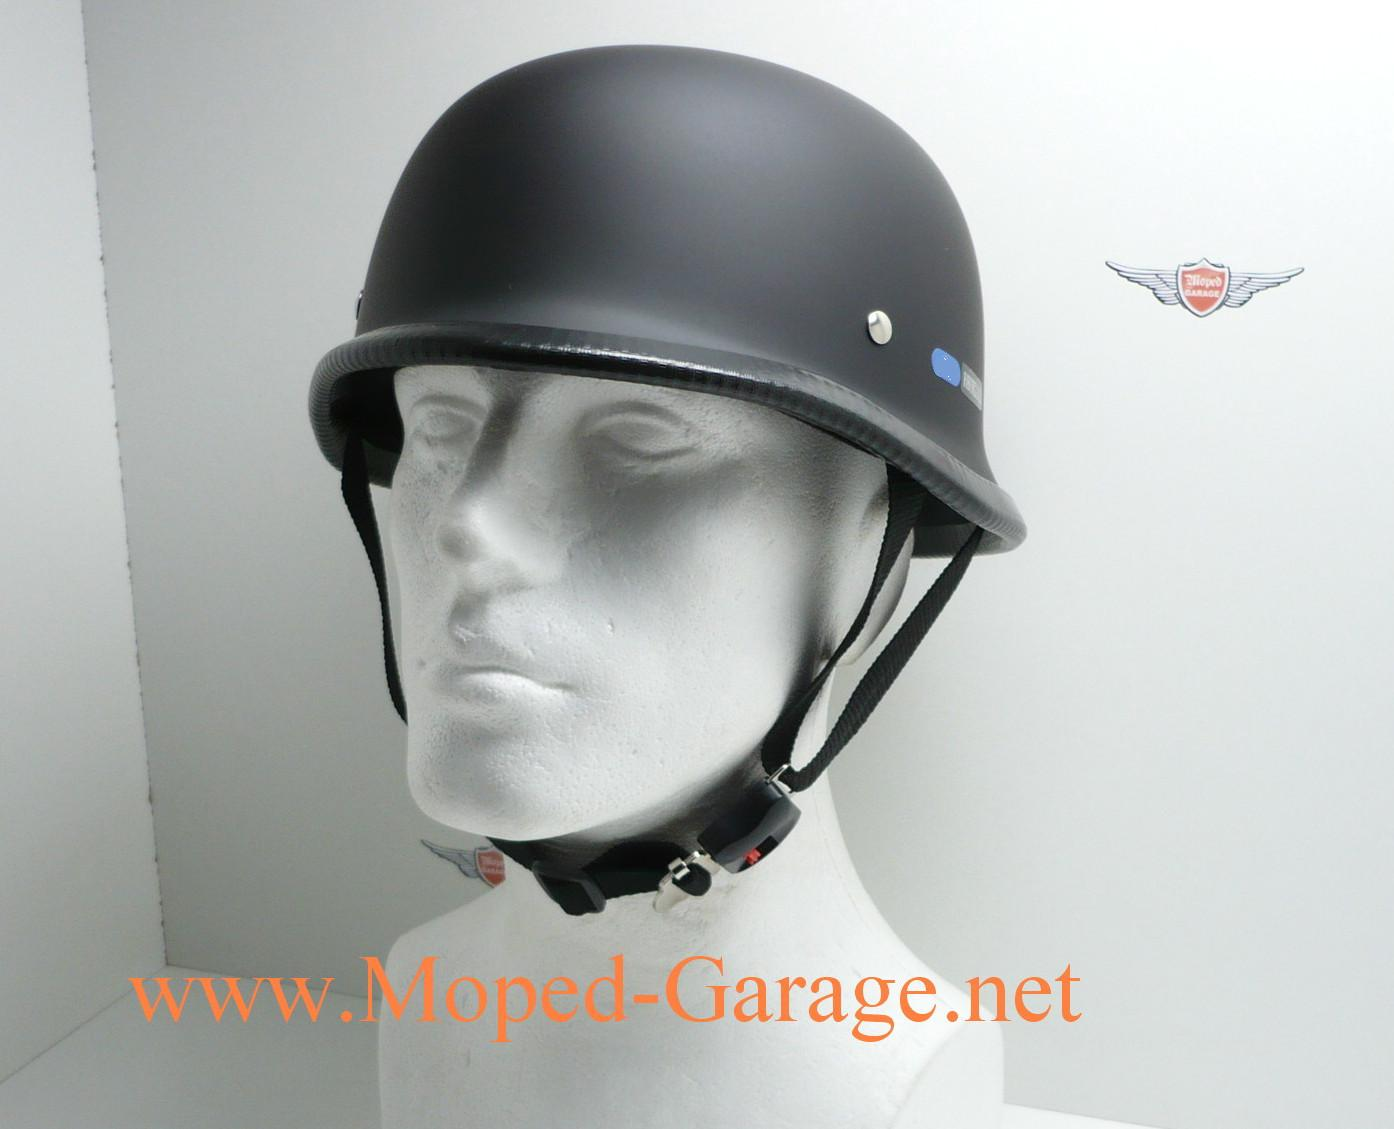 moped motorrad chopper stahlhelm halbschalen. Black Bedroom Furniture Sets. Home Design Ideas